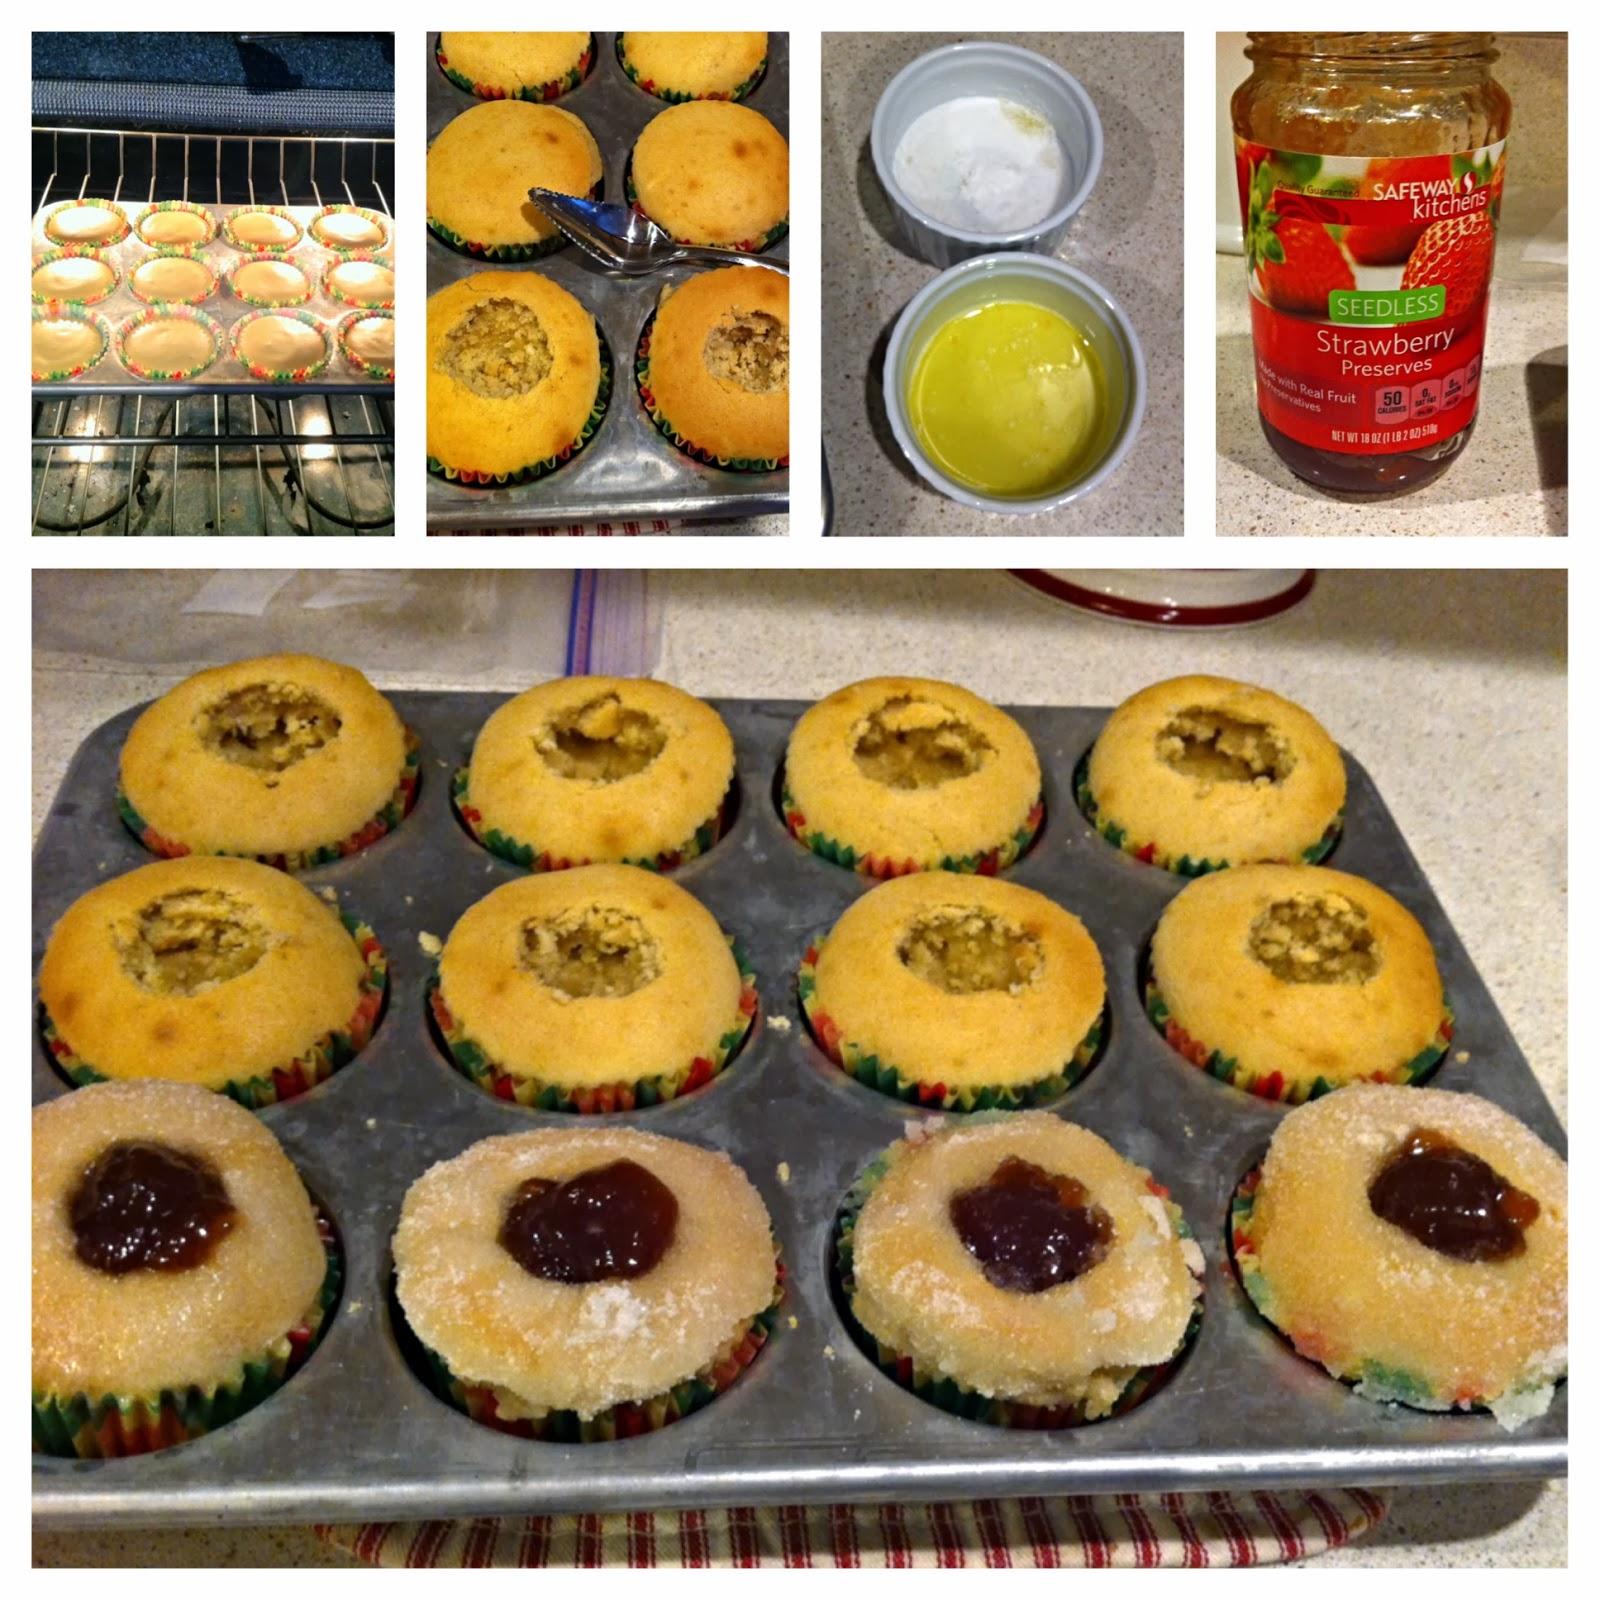 Strawberry filled Doughnut Muffin- Alohamora http://alohamoraopenabook.blogspot.com/